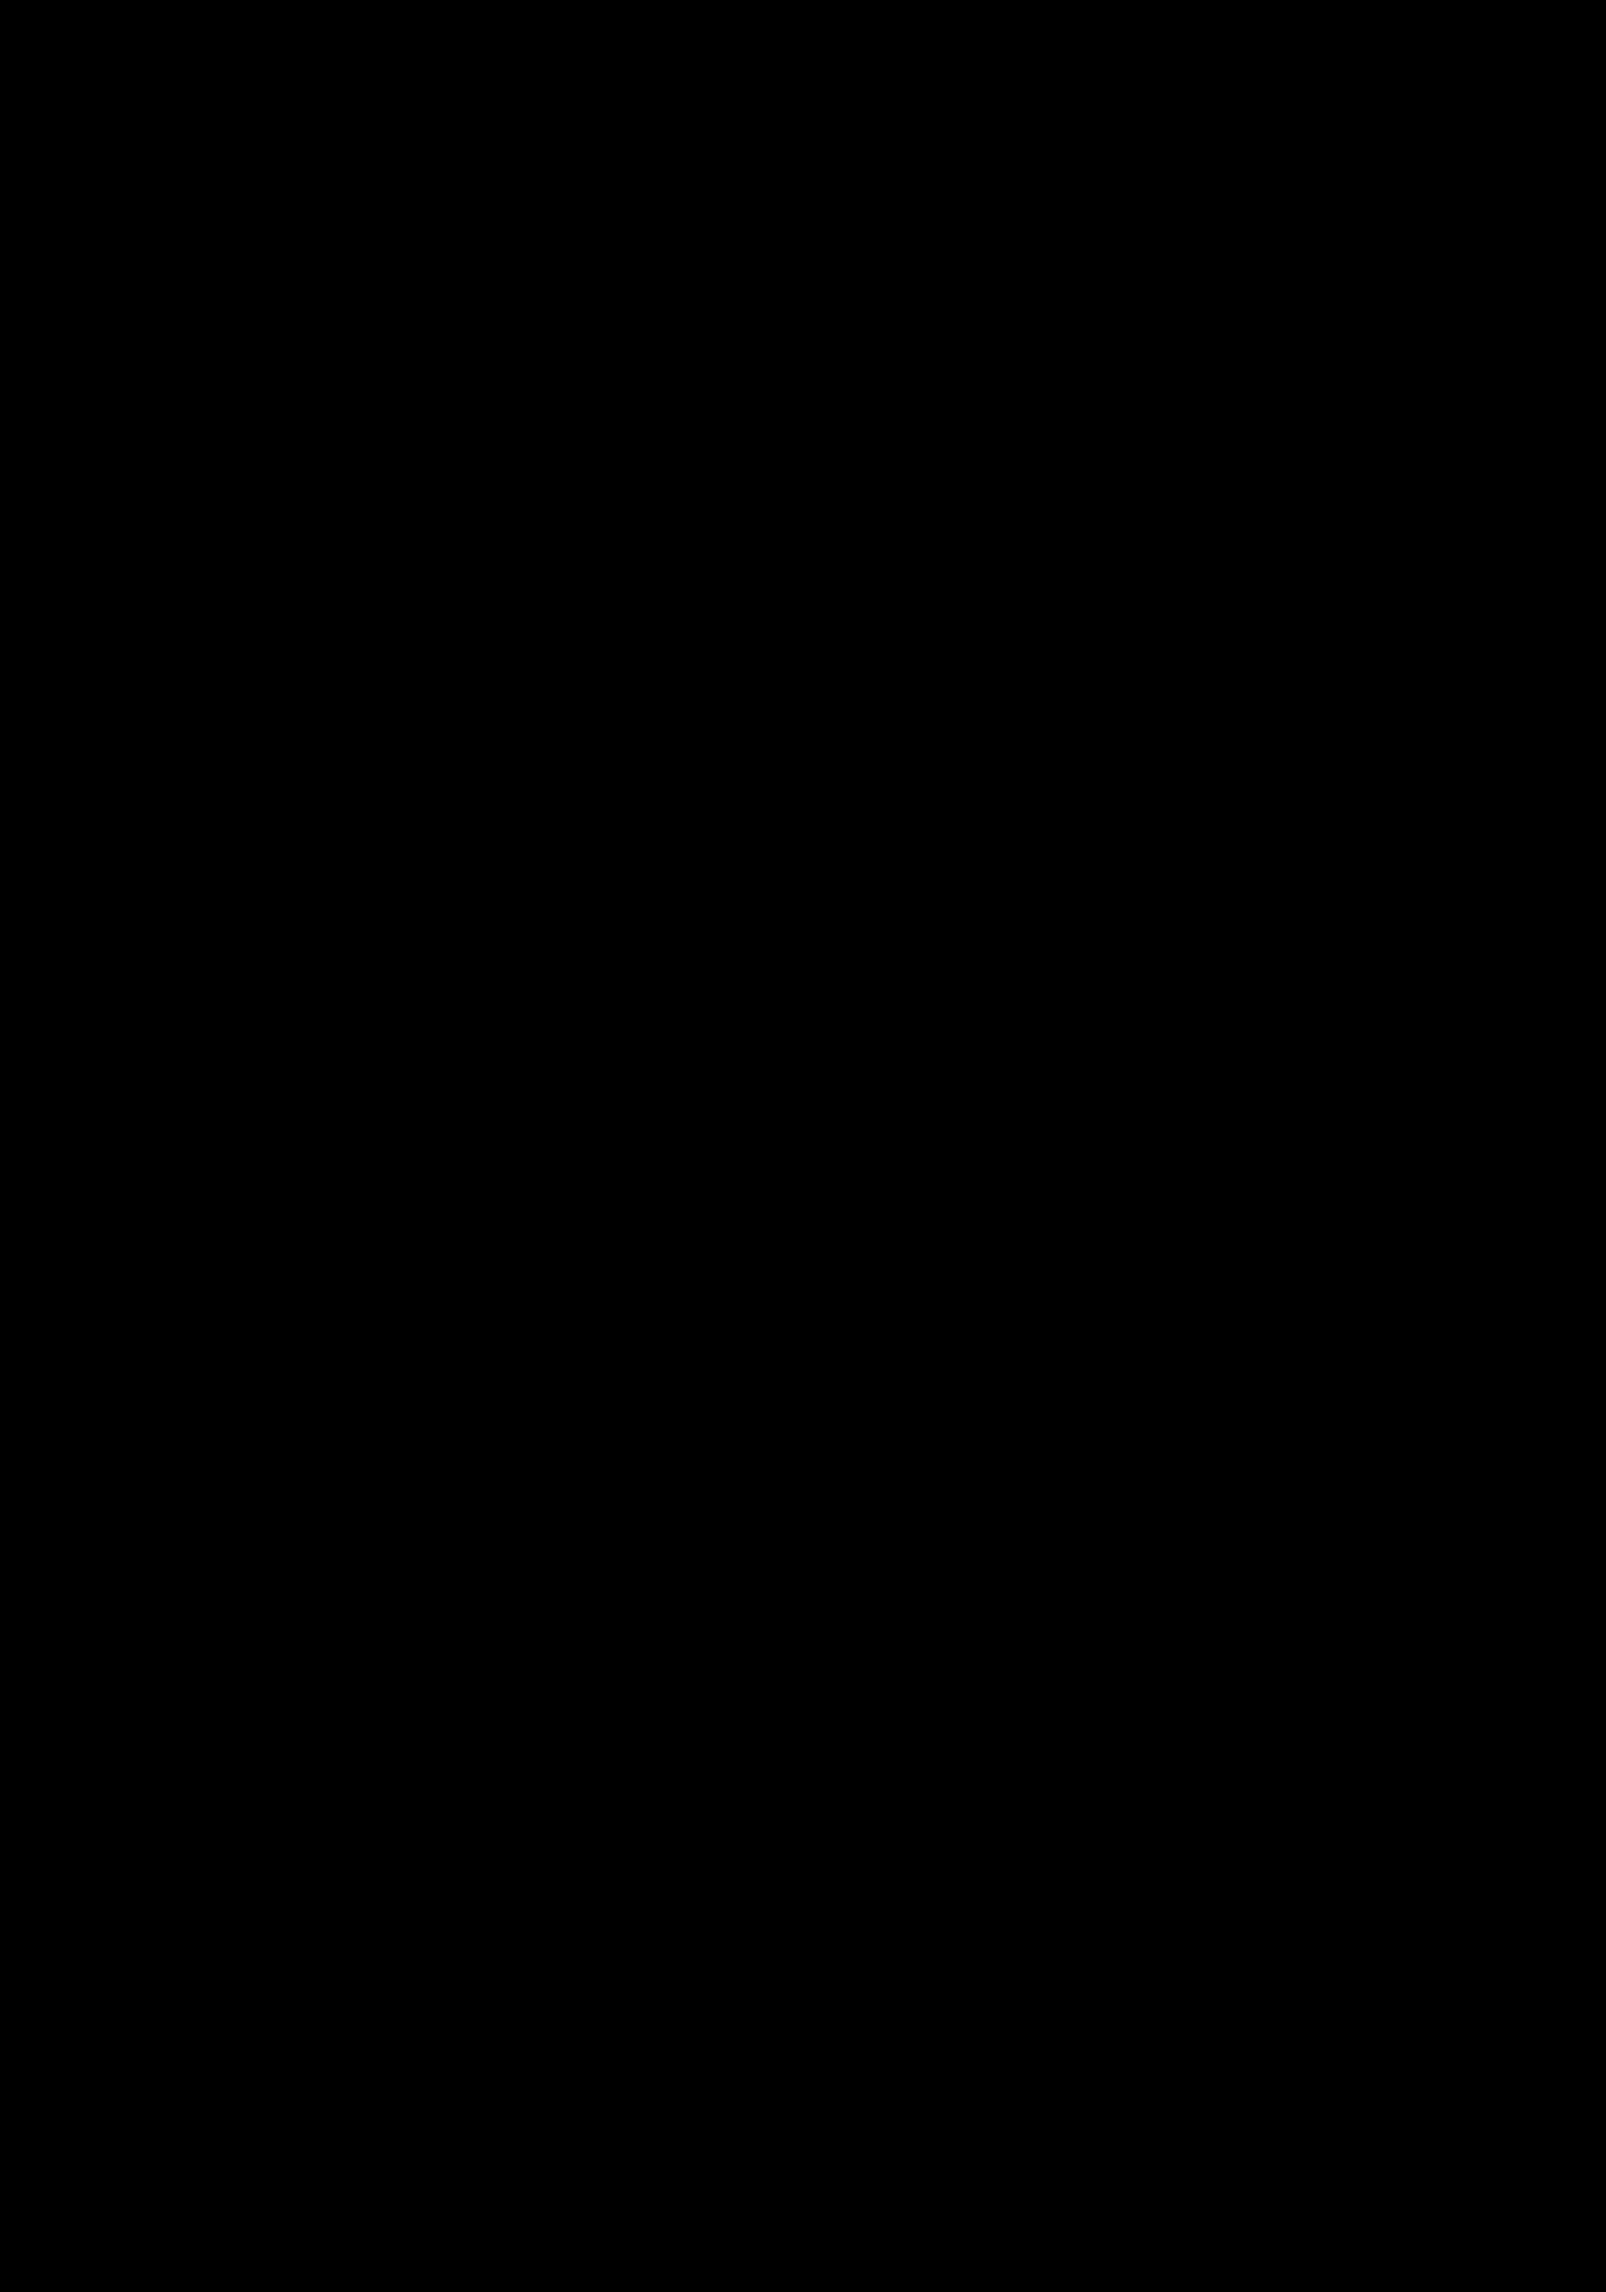 Alpaca silhouette clipart banner black and white download Llama Alpaca Clip art - animal silhouettes png download - 1606*2292 ... banner black and white download